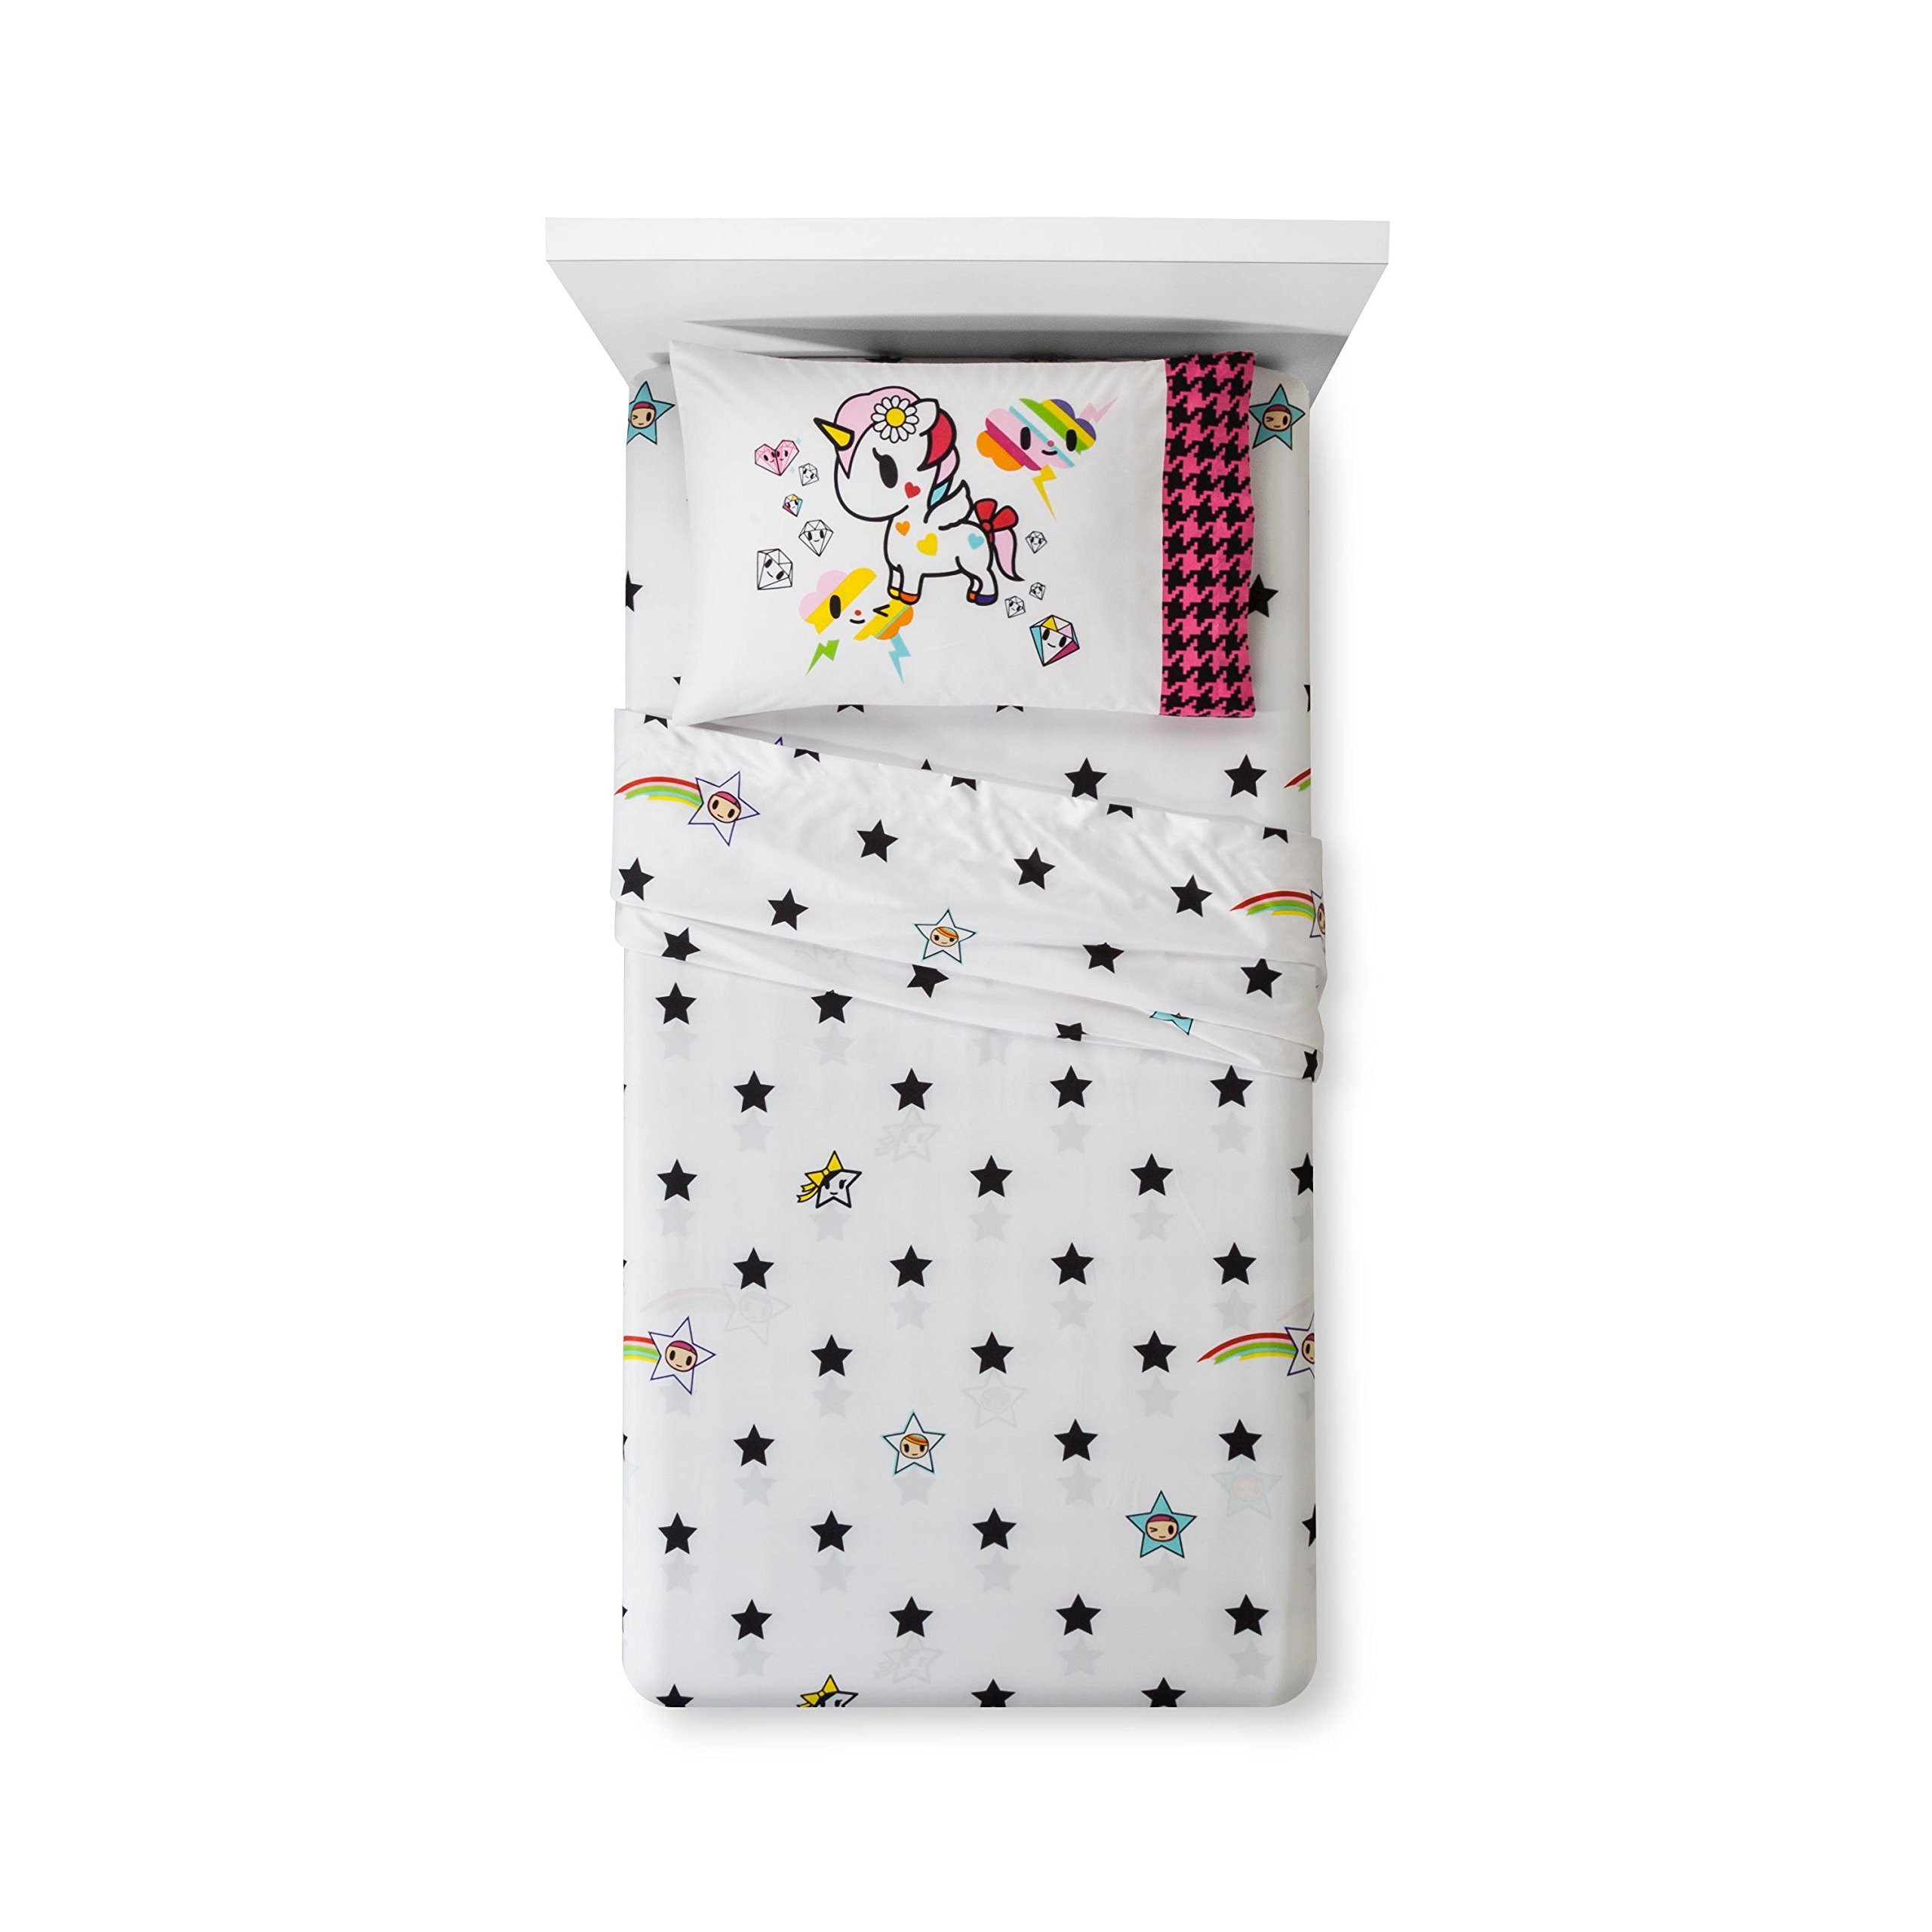 Neonstar by Tokidoki I Love Unicorns 4pc Bedding Set Comforter + Sheets (Twin Size) by Jay Franco (Image #3)